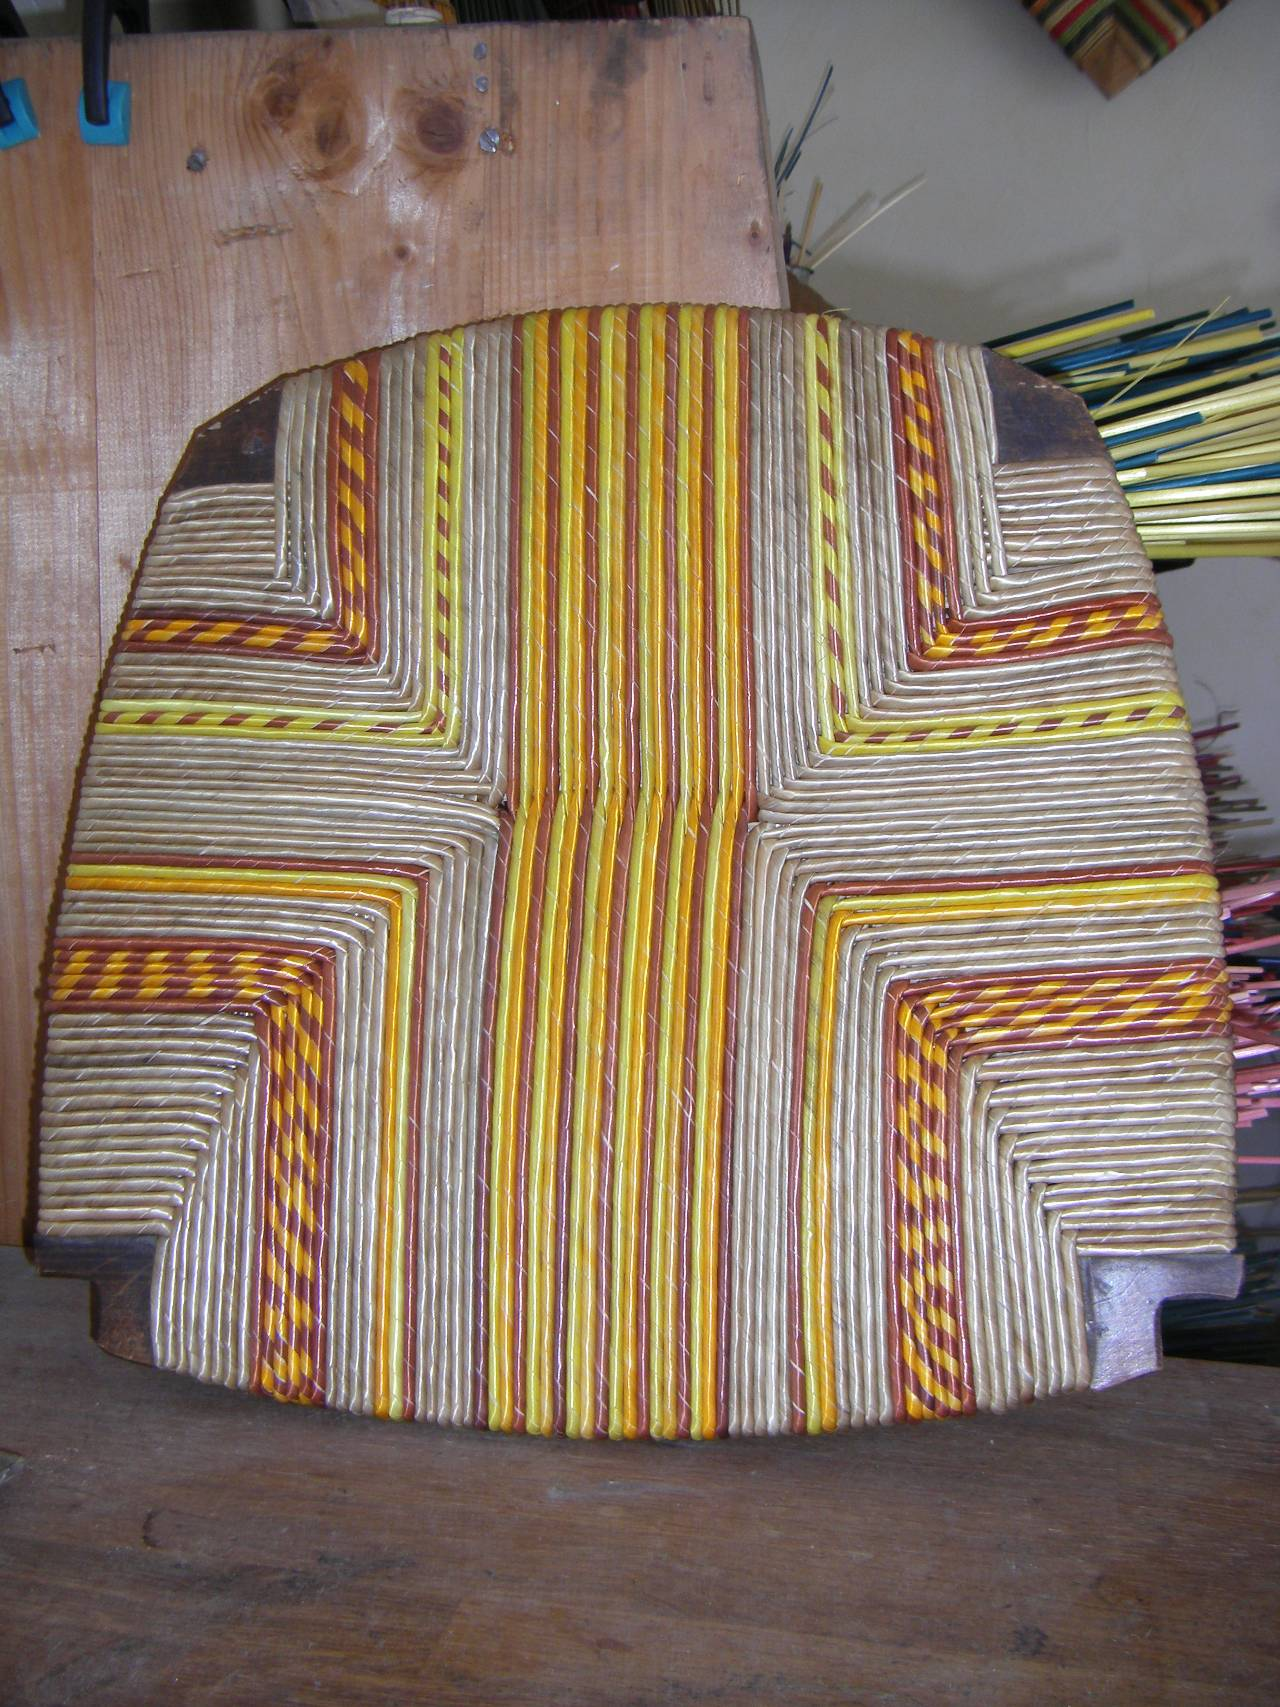 Rush chair repair, rush chair seat design, chair upholstery